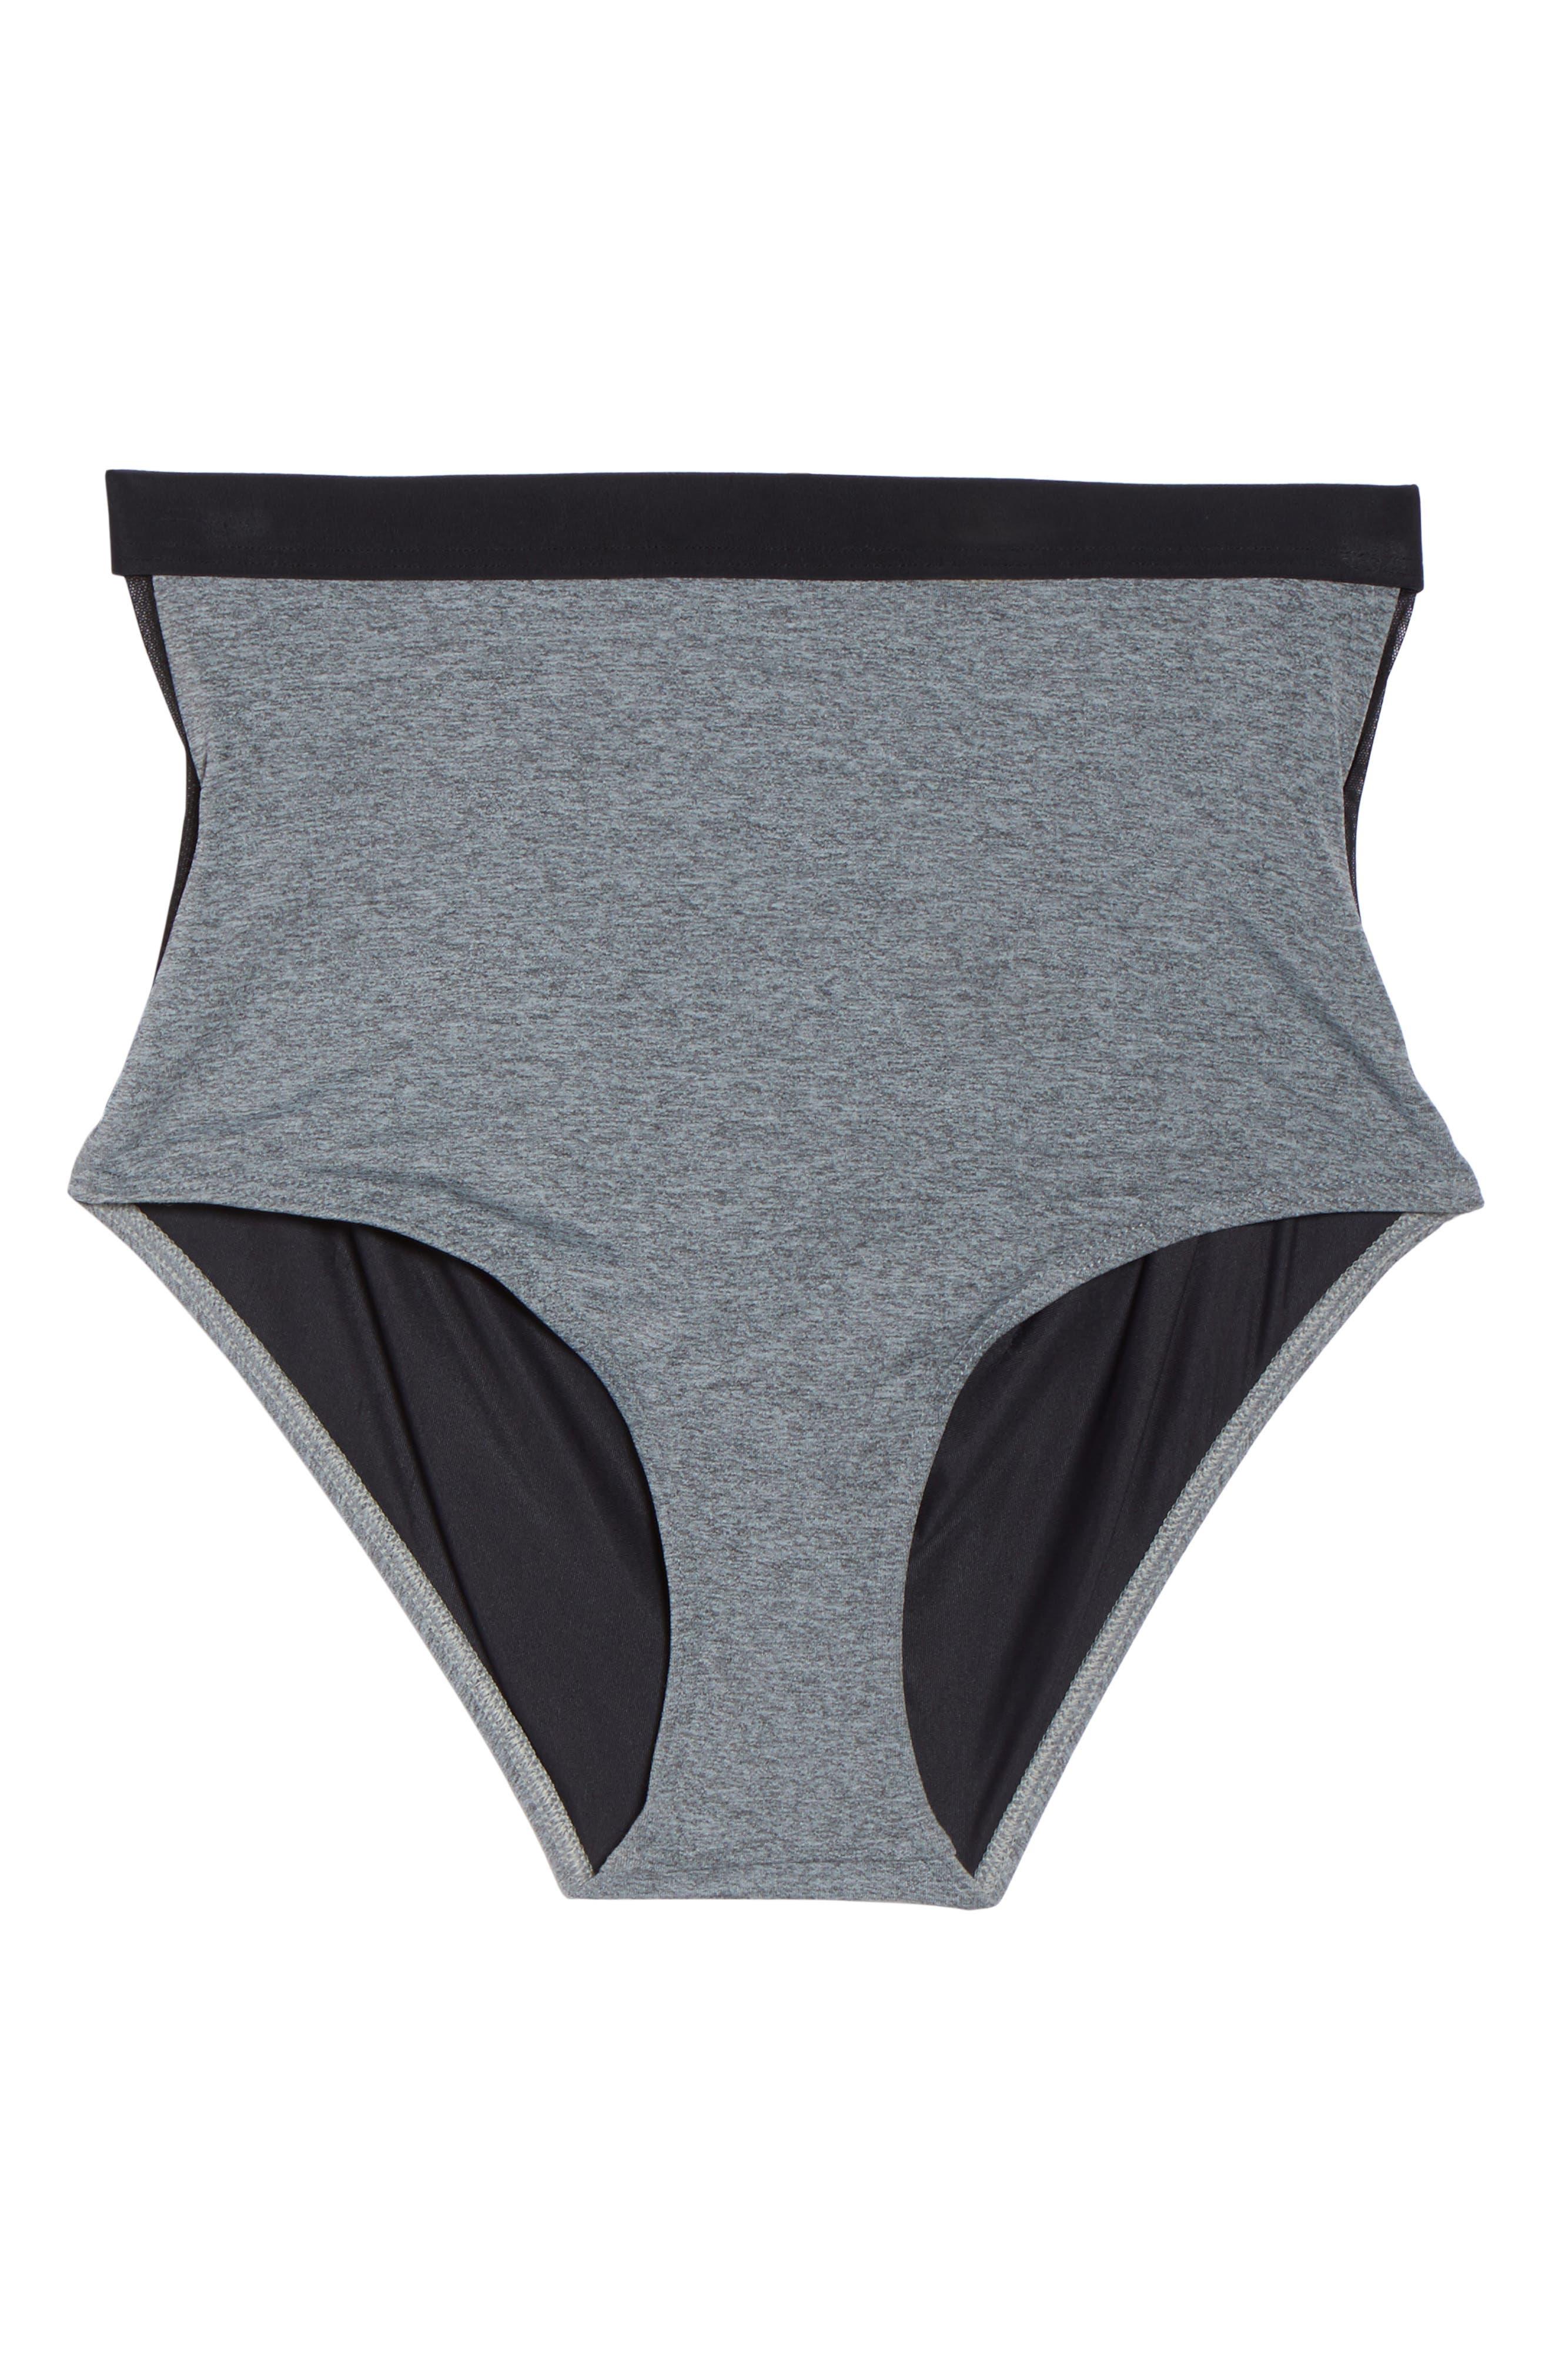 Yoko High Waist Bikini Bottoms,                             Alternate thumbnail 6, color,                             020